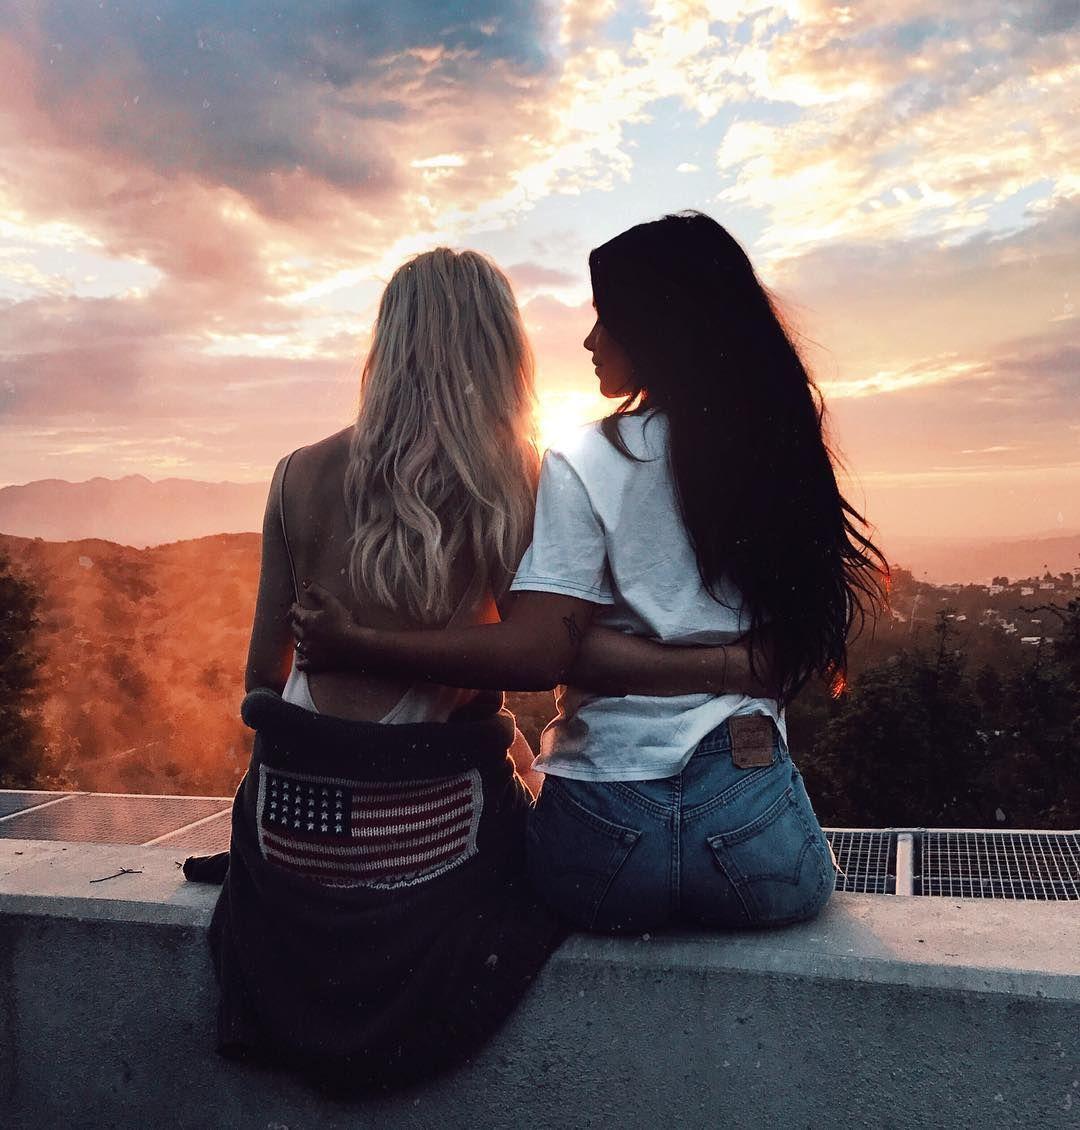 Картинки про дружбу лучших